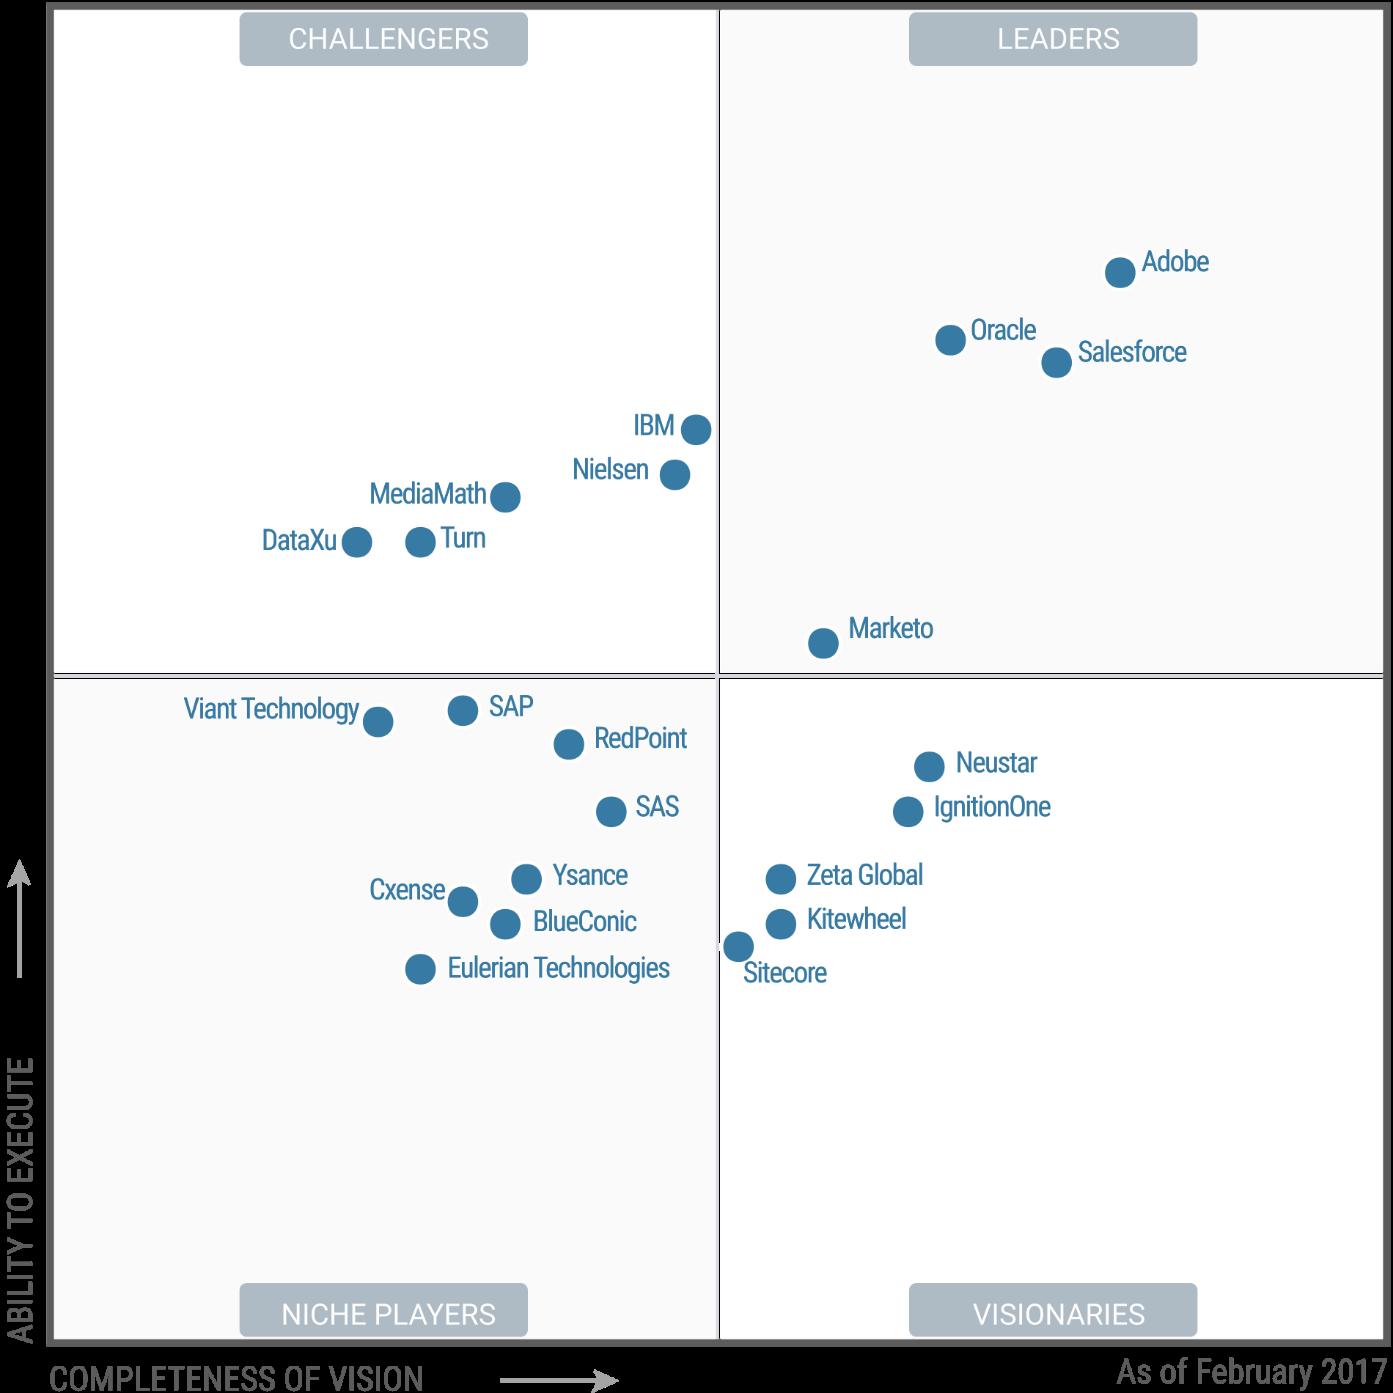 Gartner Magic Quadrant for Digital Marketing Hubs